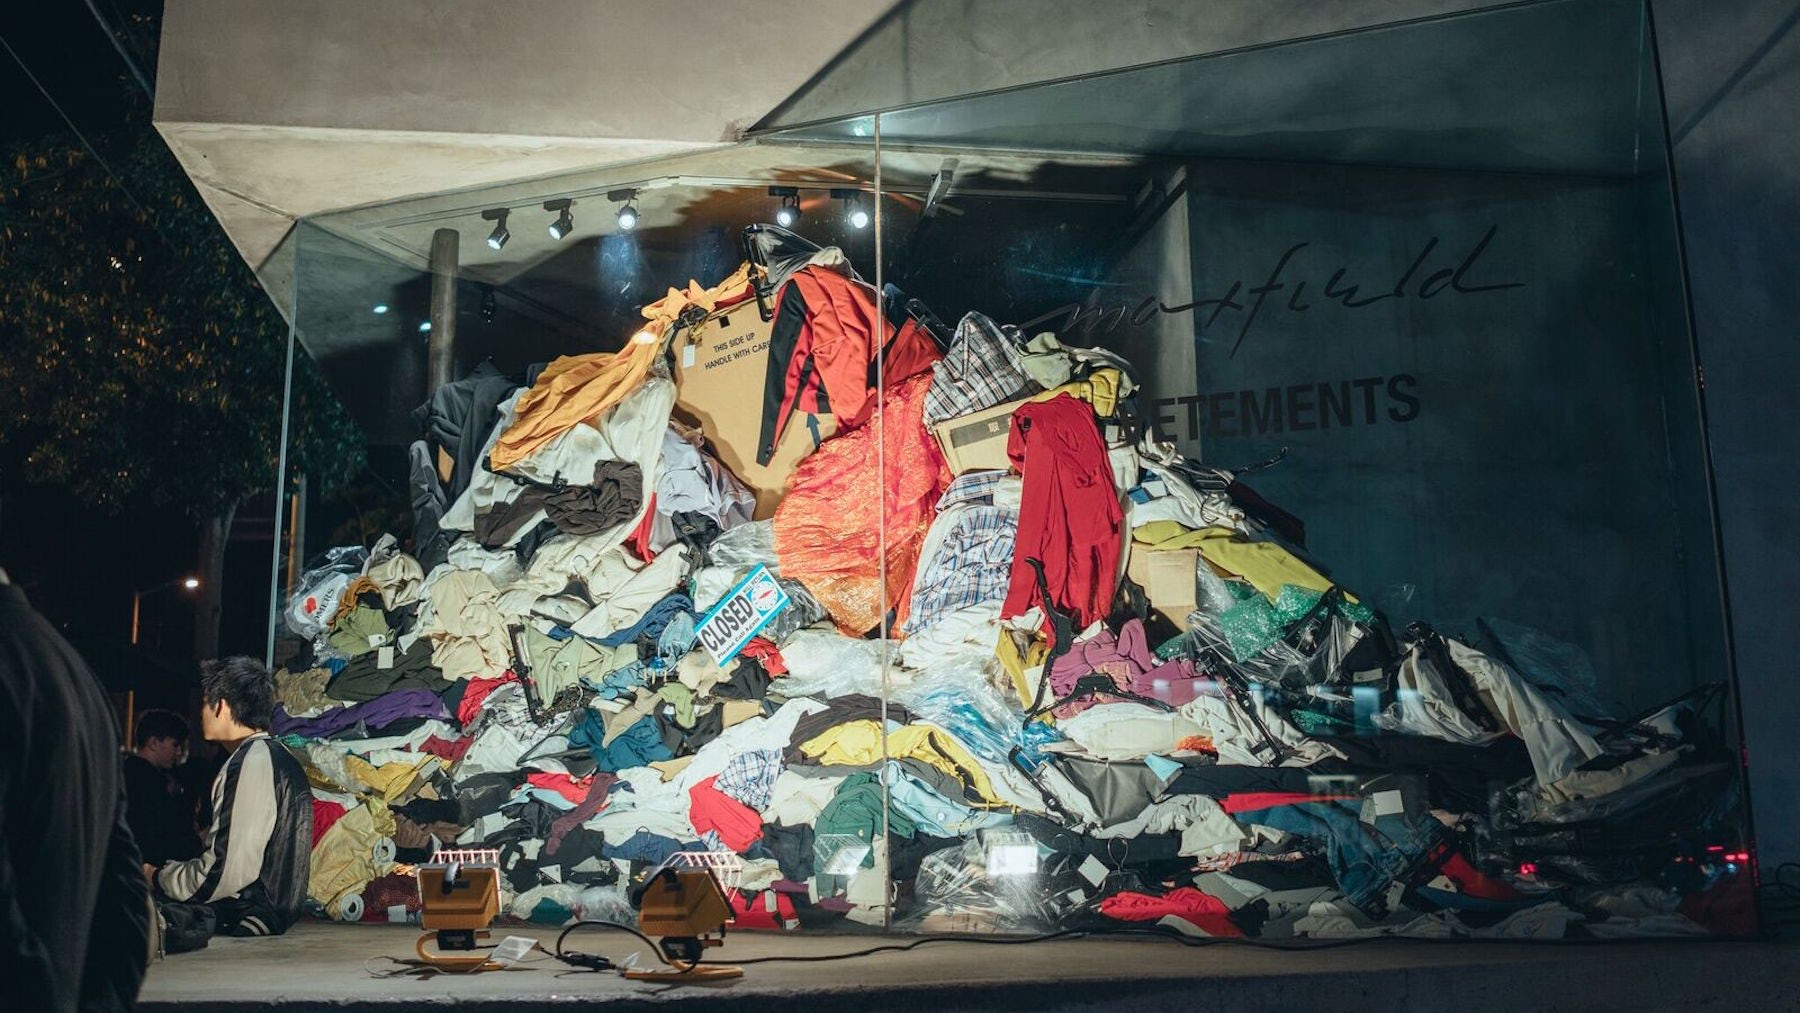 Vetements and Daft Punk Pop-Ups Cast Los Angeles as Fashionable Petri Dish